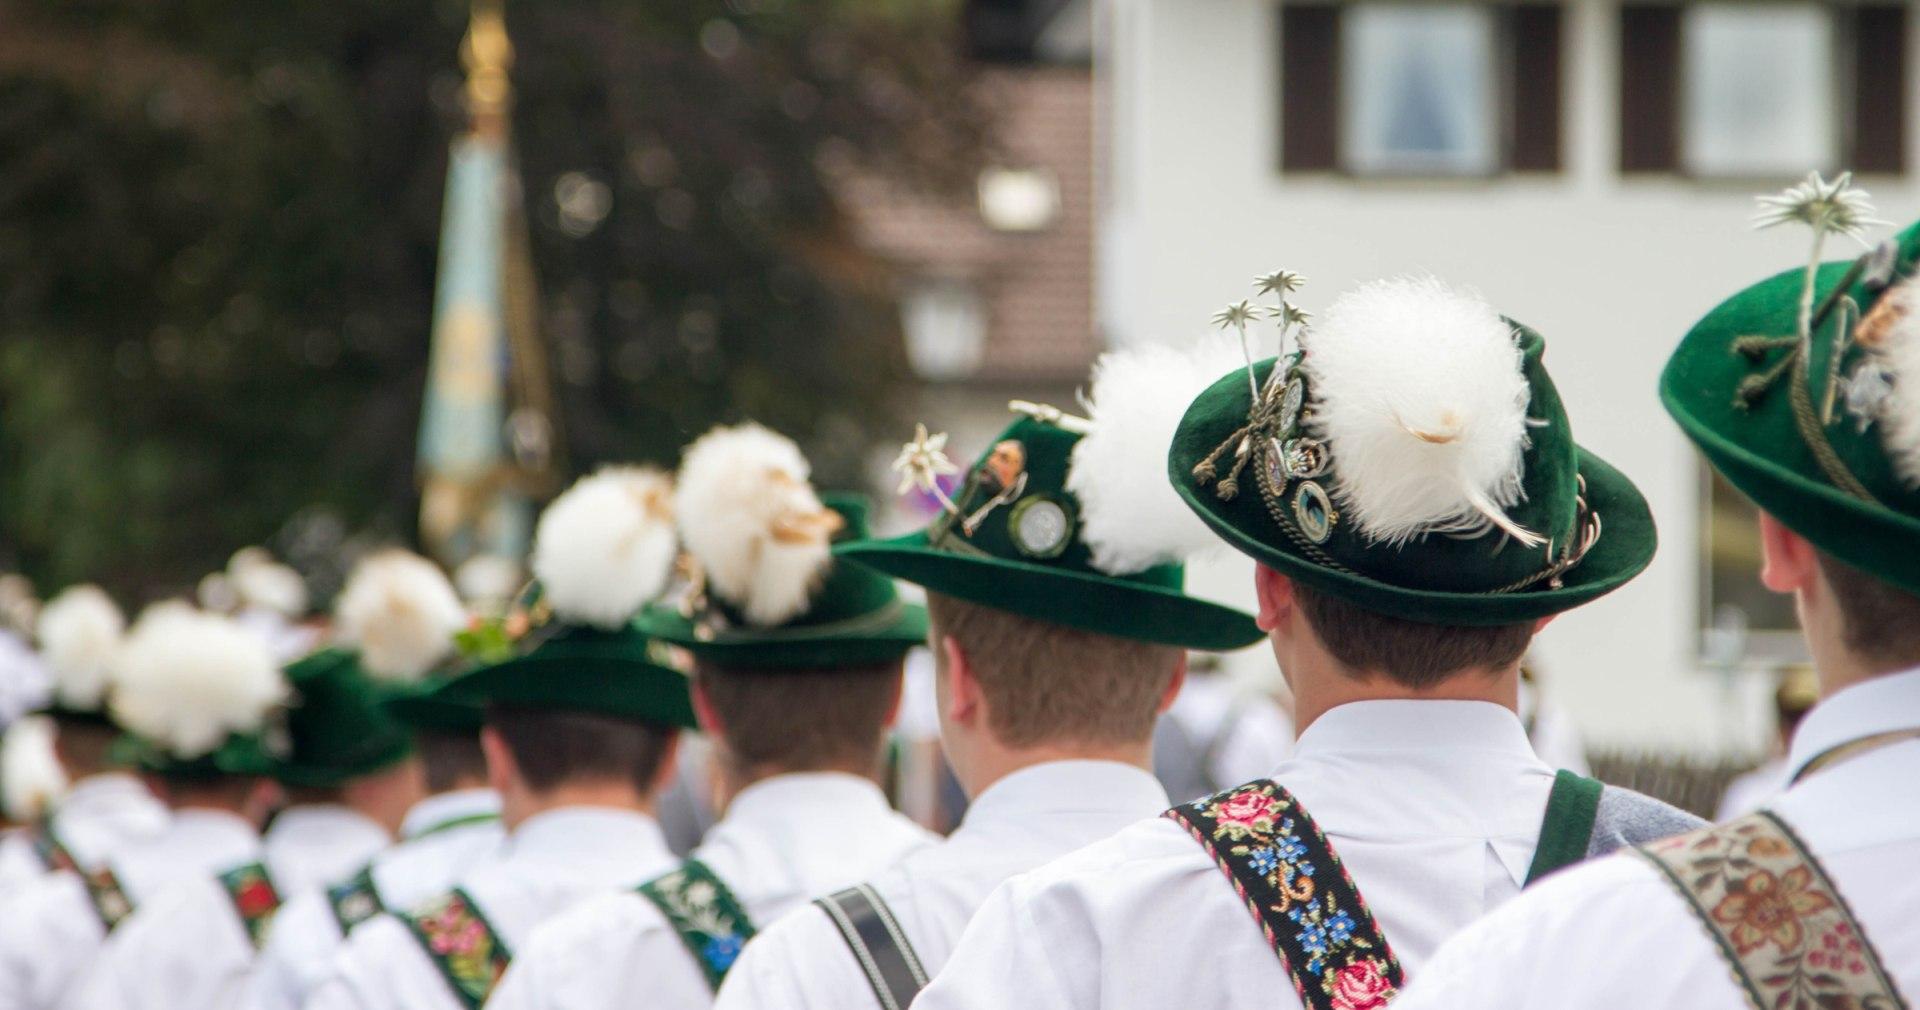 Grainau, Brauchtum, Tradition, Parkfest, © Touristinformation Grainau